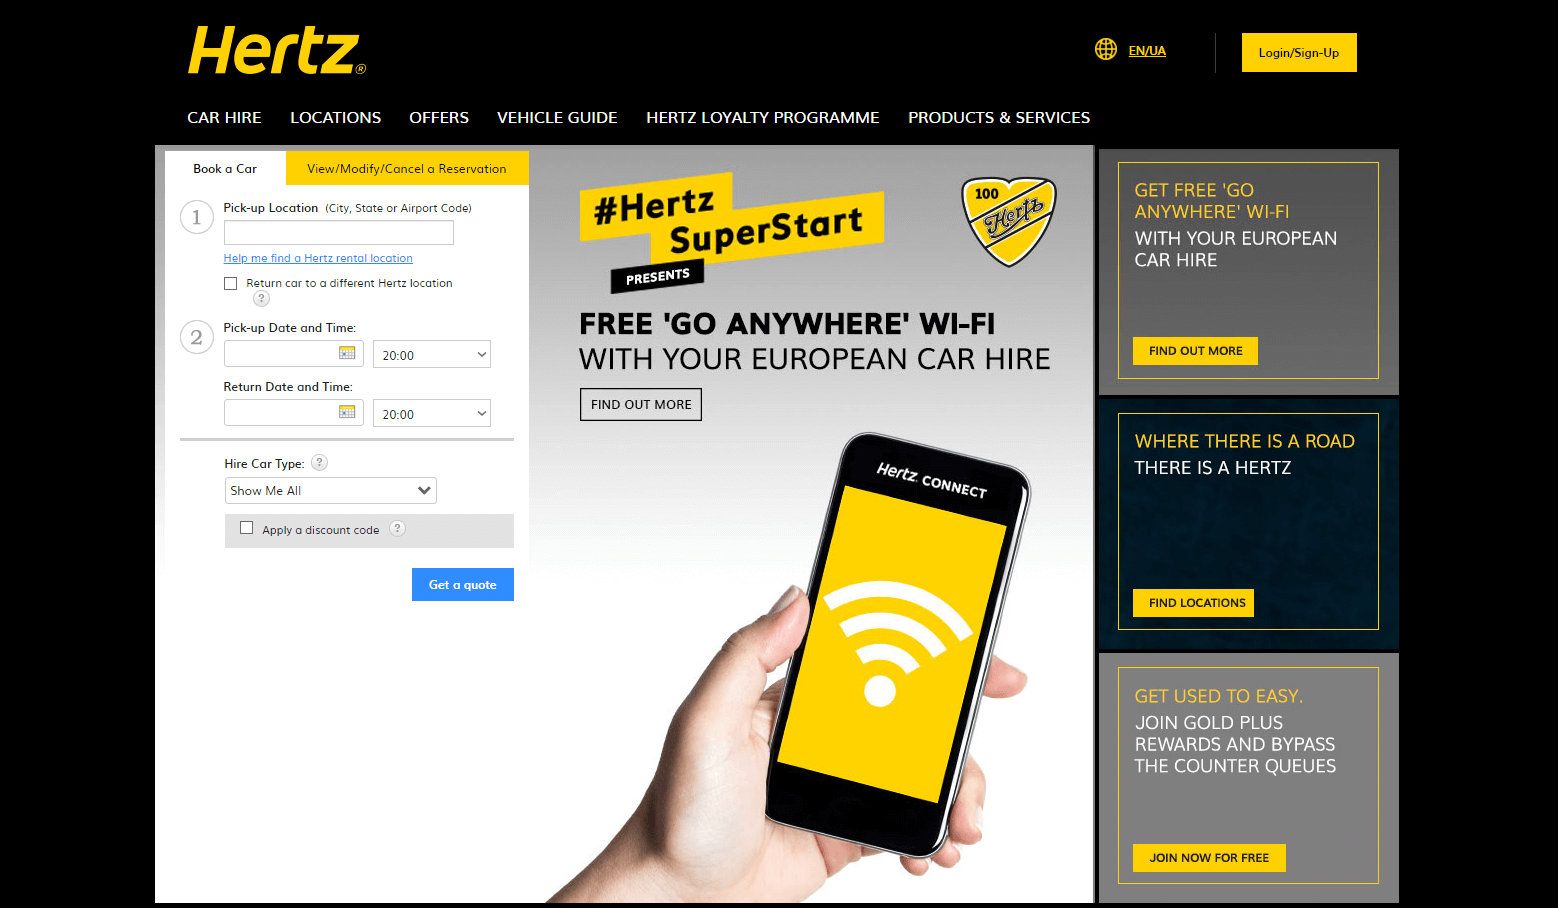 hertz.com